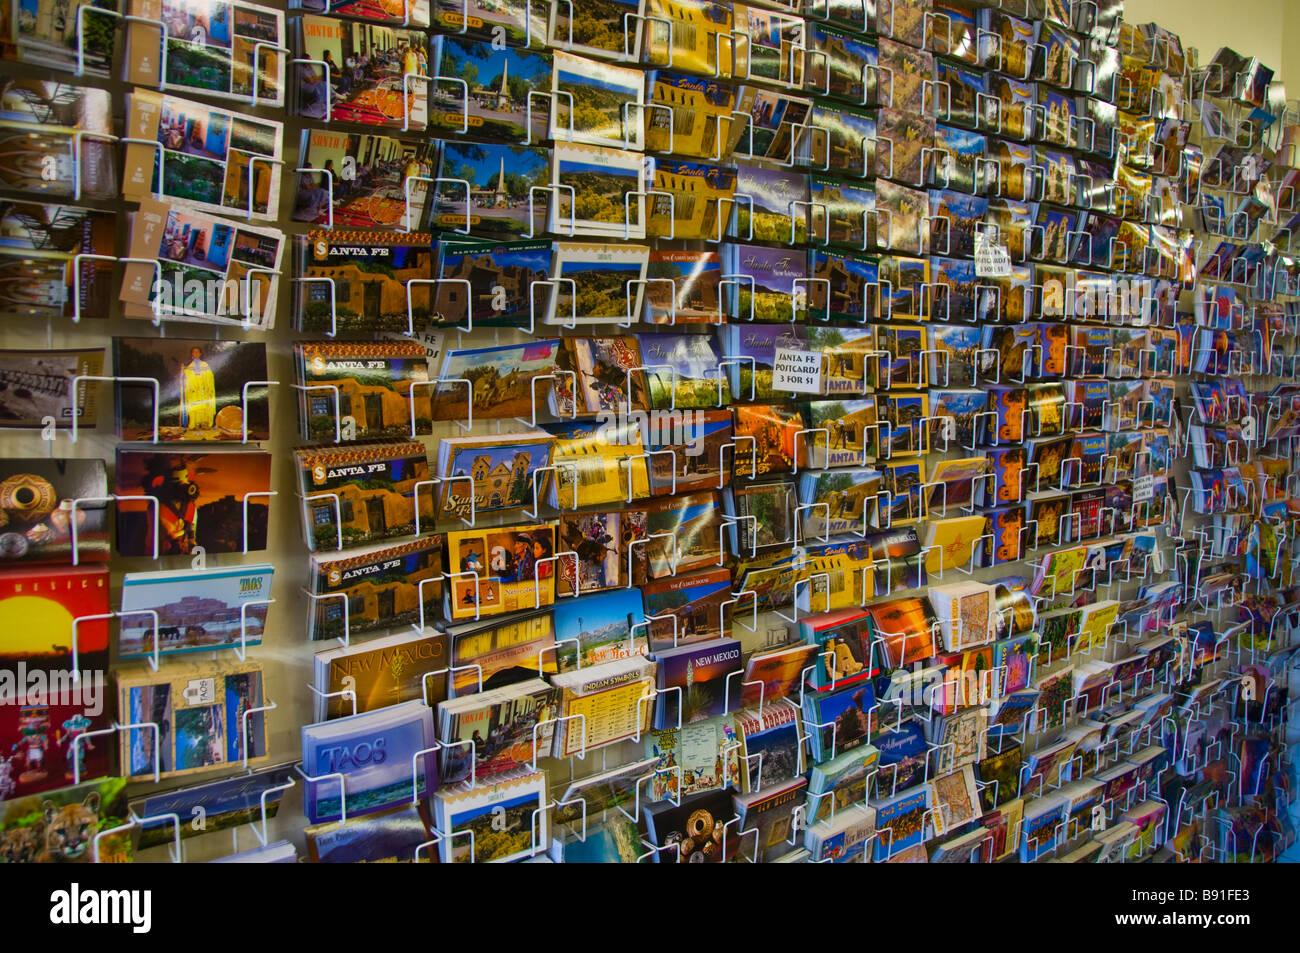 Wall display of travel postcards - Stock Image